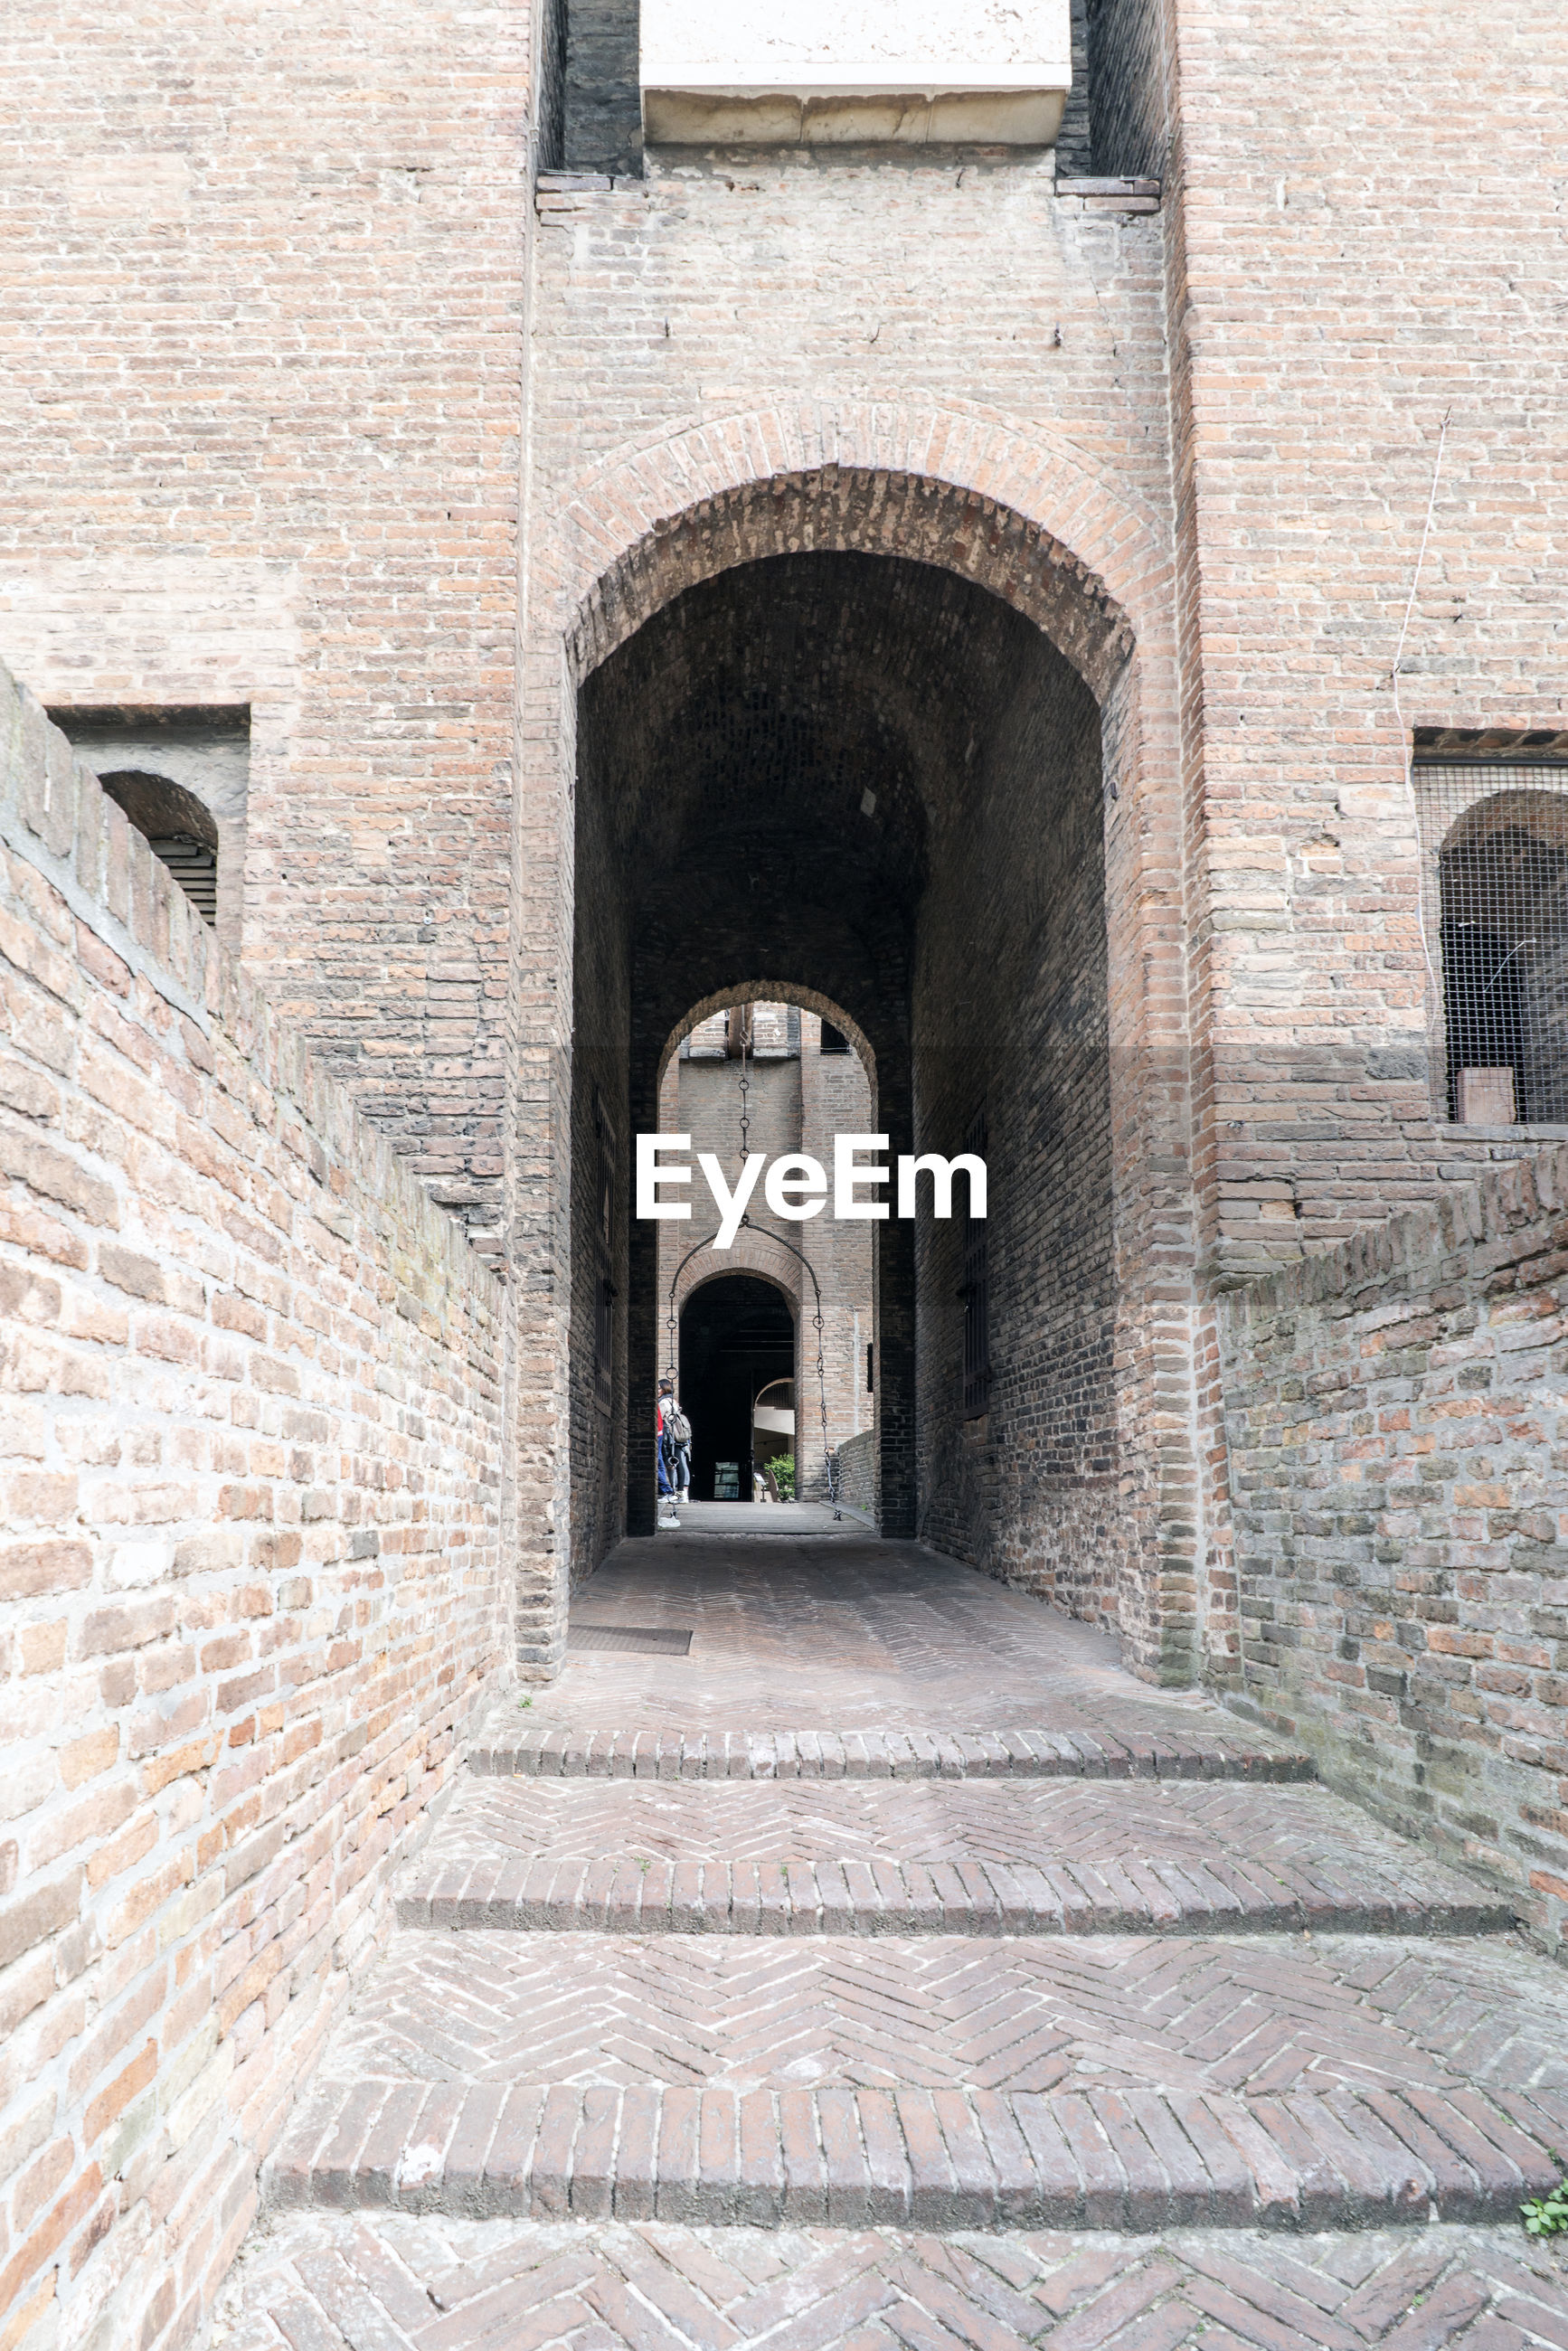 MAN WALKING IN HISTORICAL BUILDING